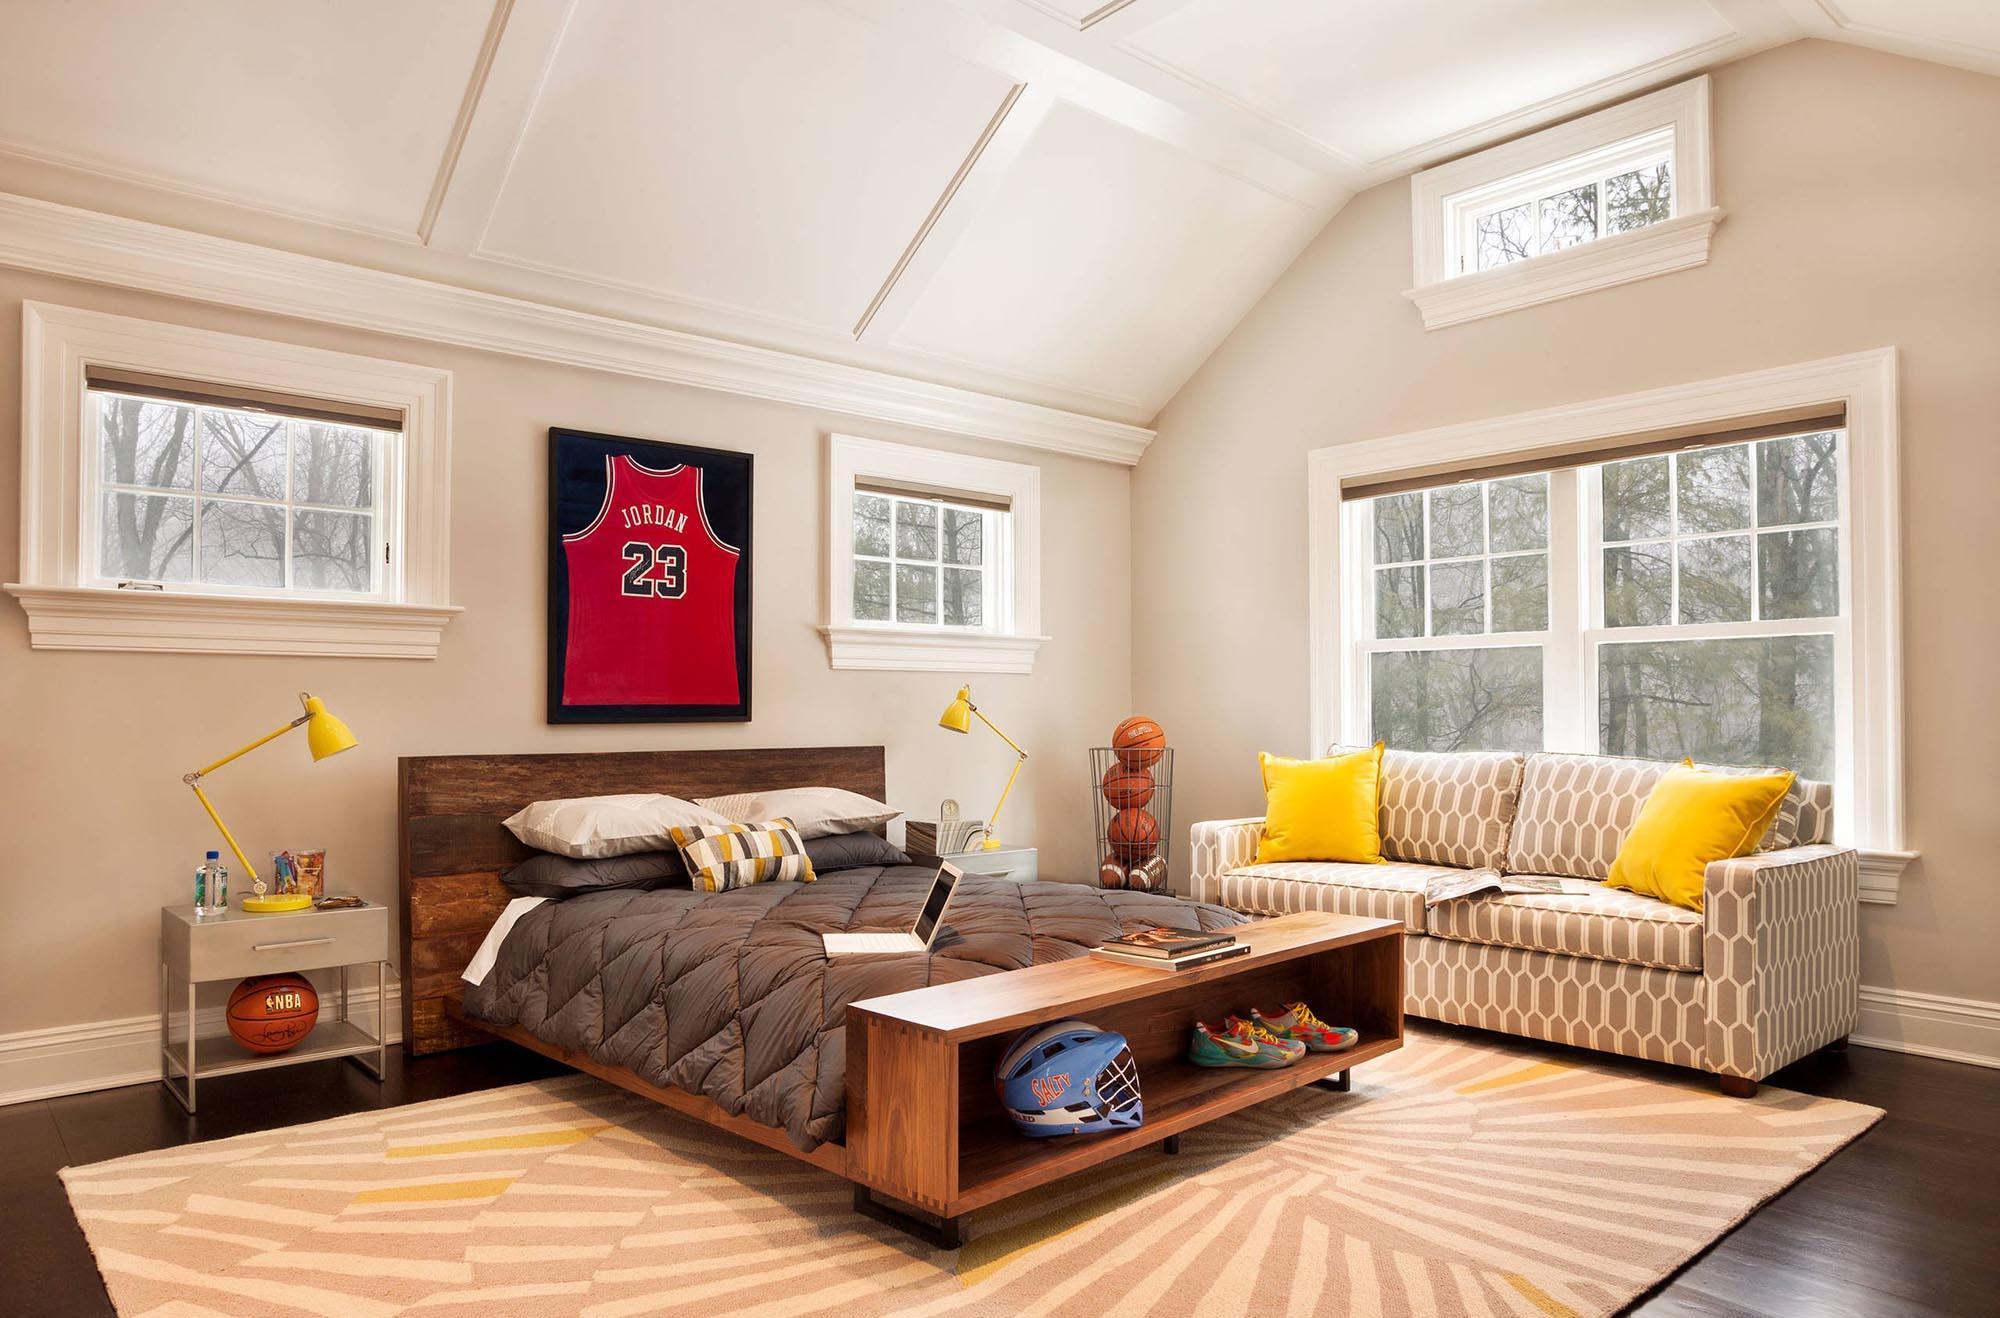 Комната для подростка спортсмена